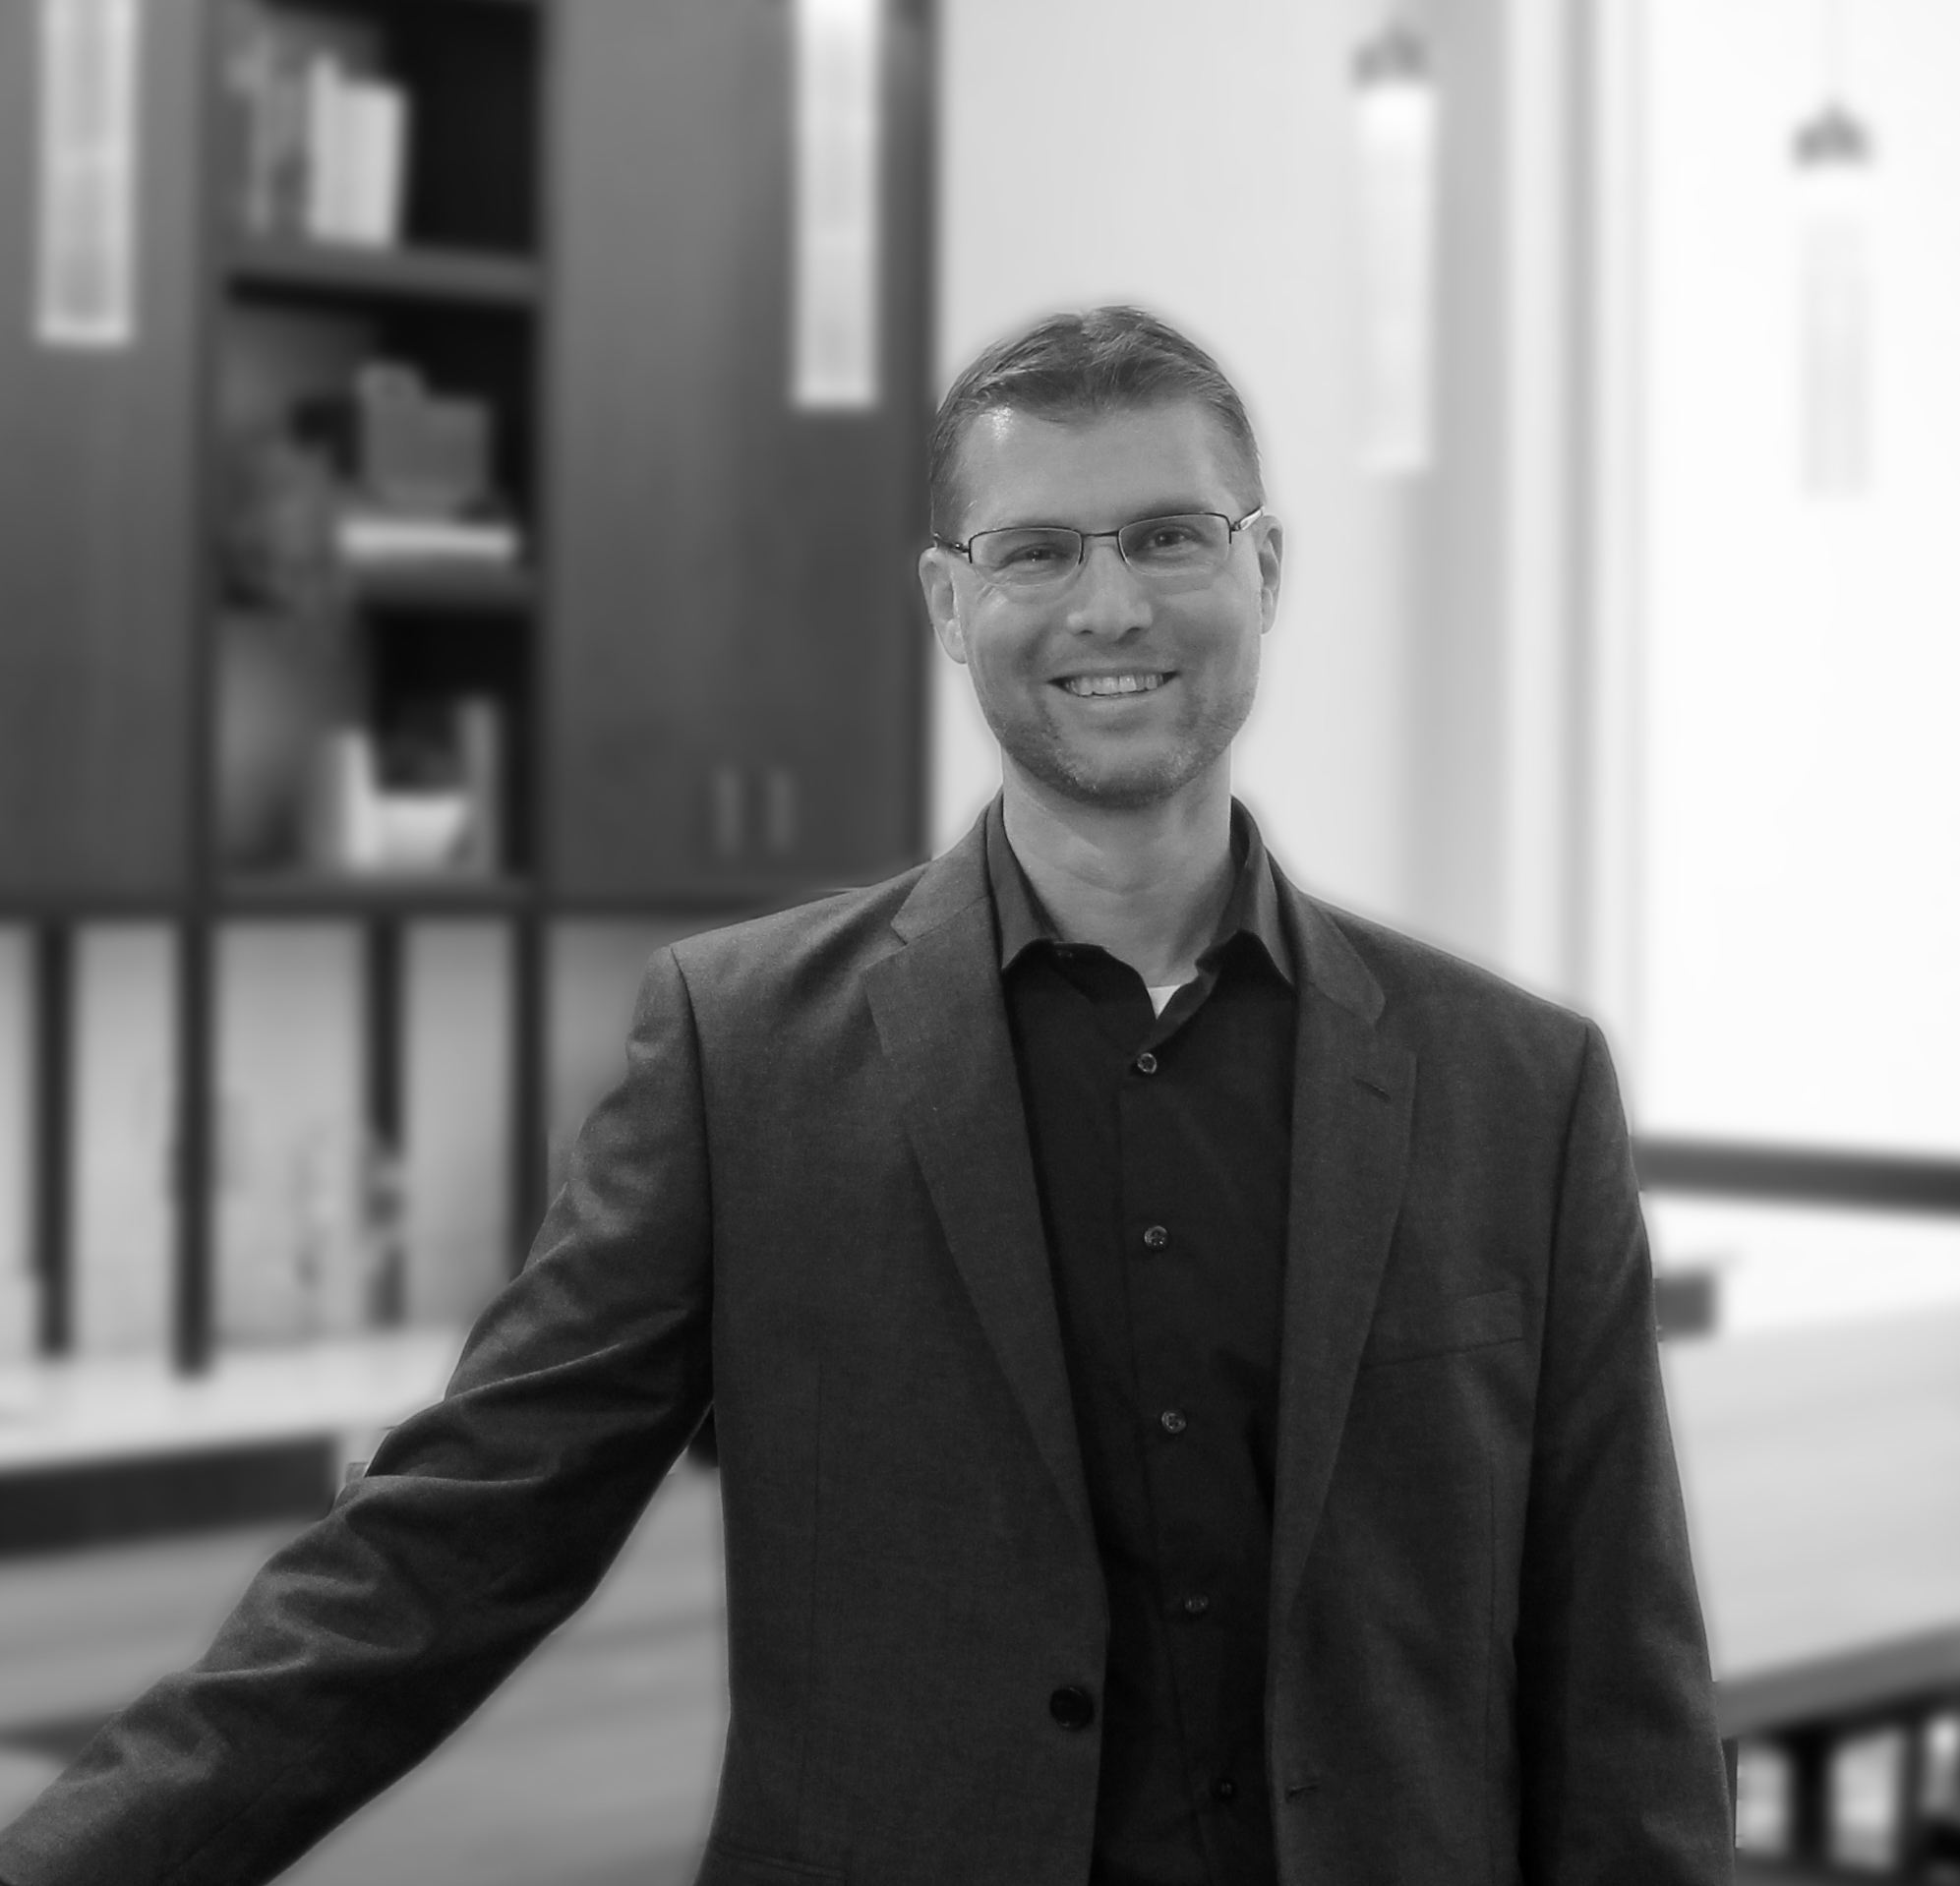 Brad Thalwitzer, P.E., LEED AP, CxA - VICE PRESIDENT